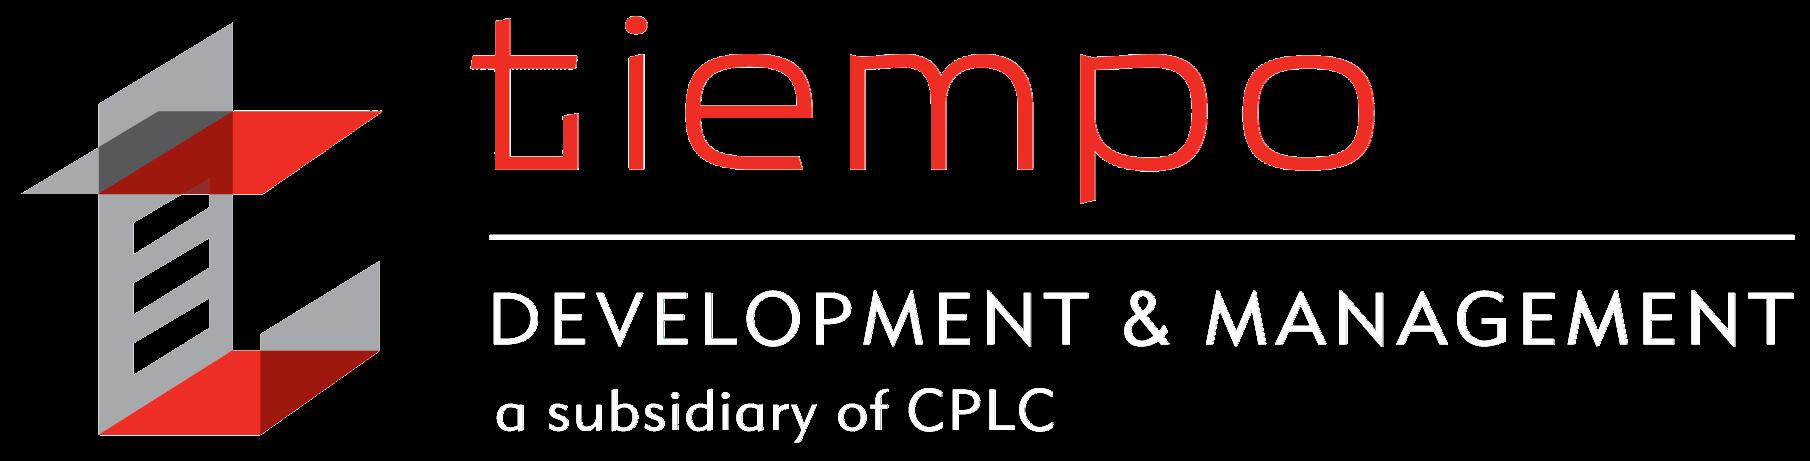 Phoenix Property Logo 14